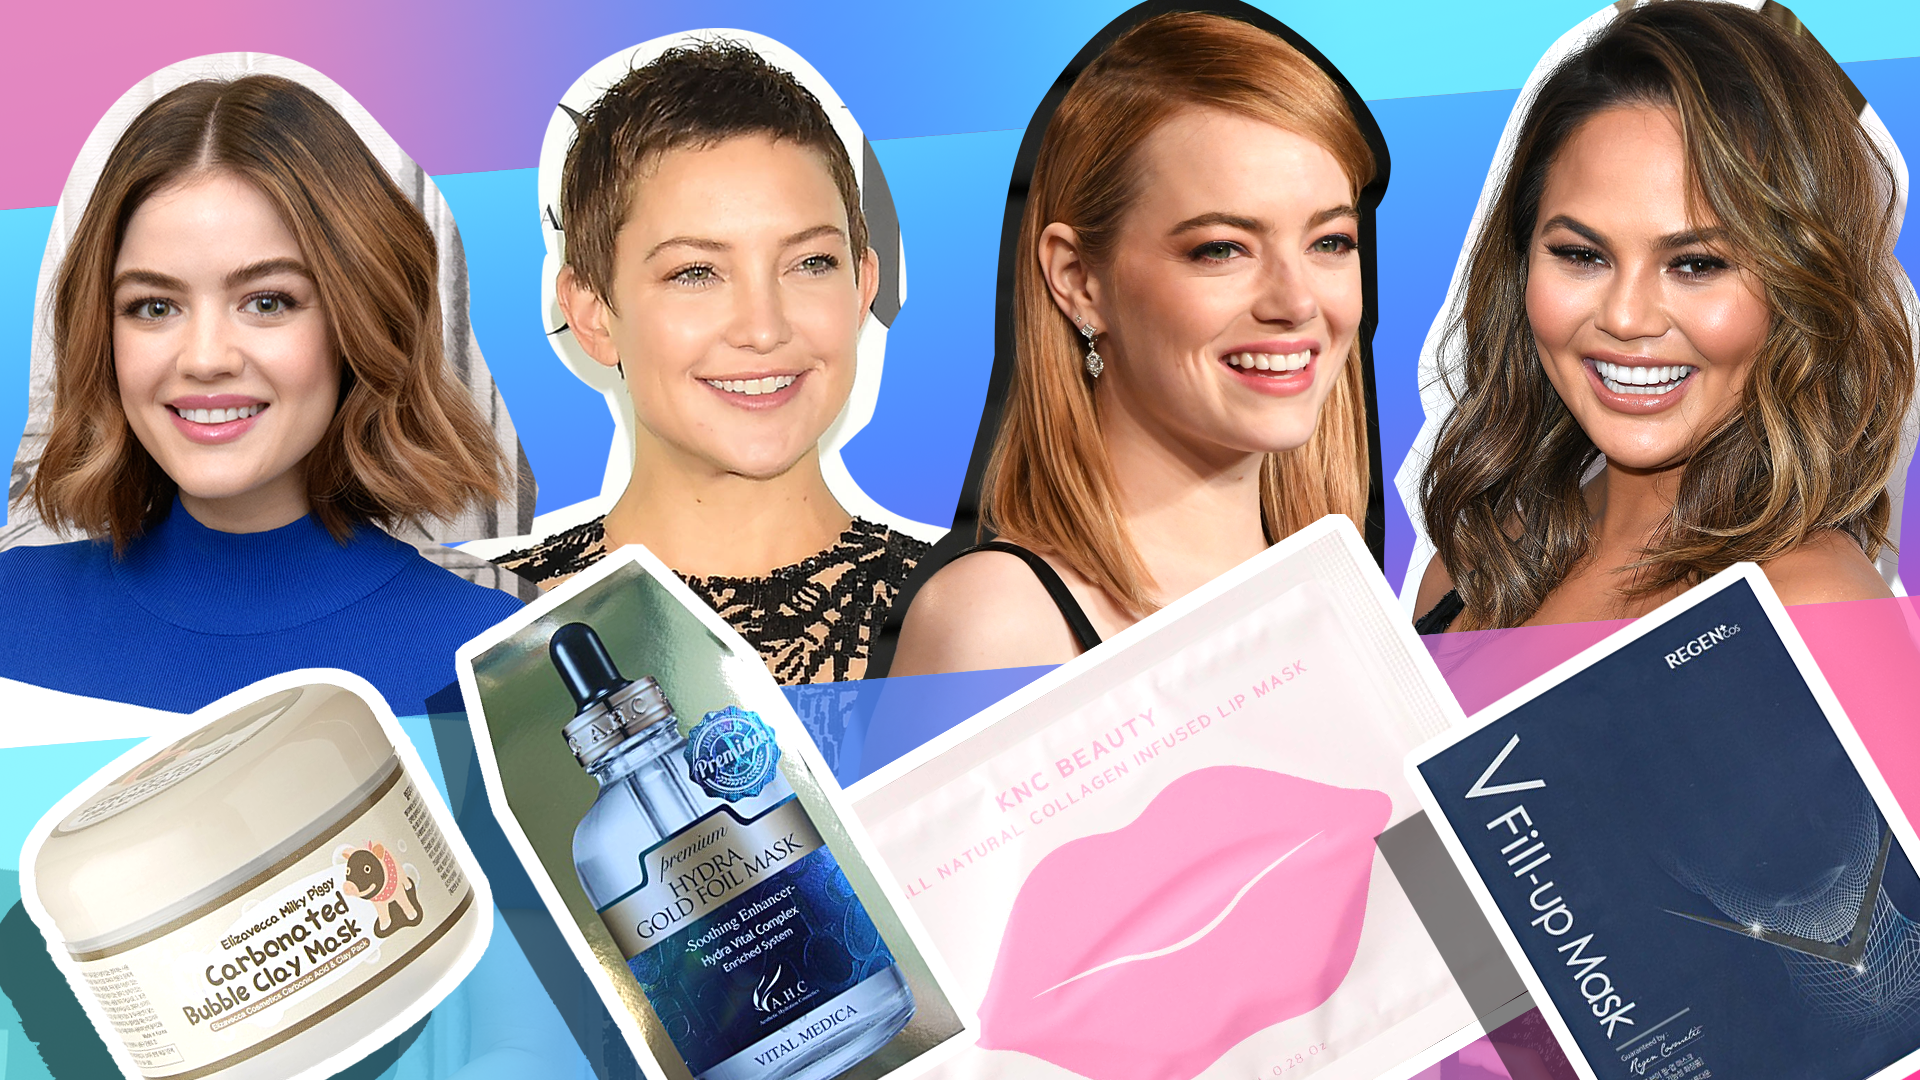 Lucy Hale, Kate Hudson, Emma Stone, Chrissy Teigen